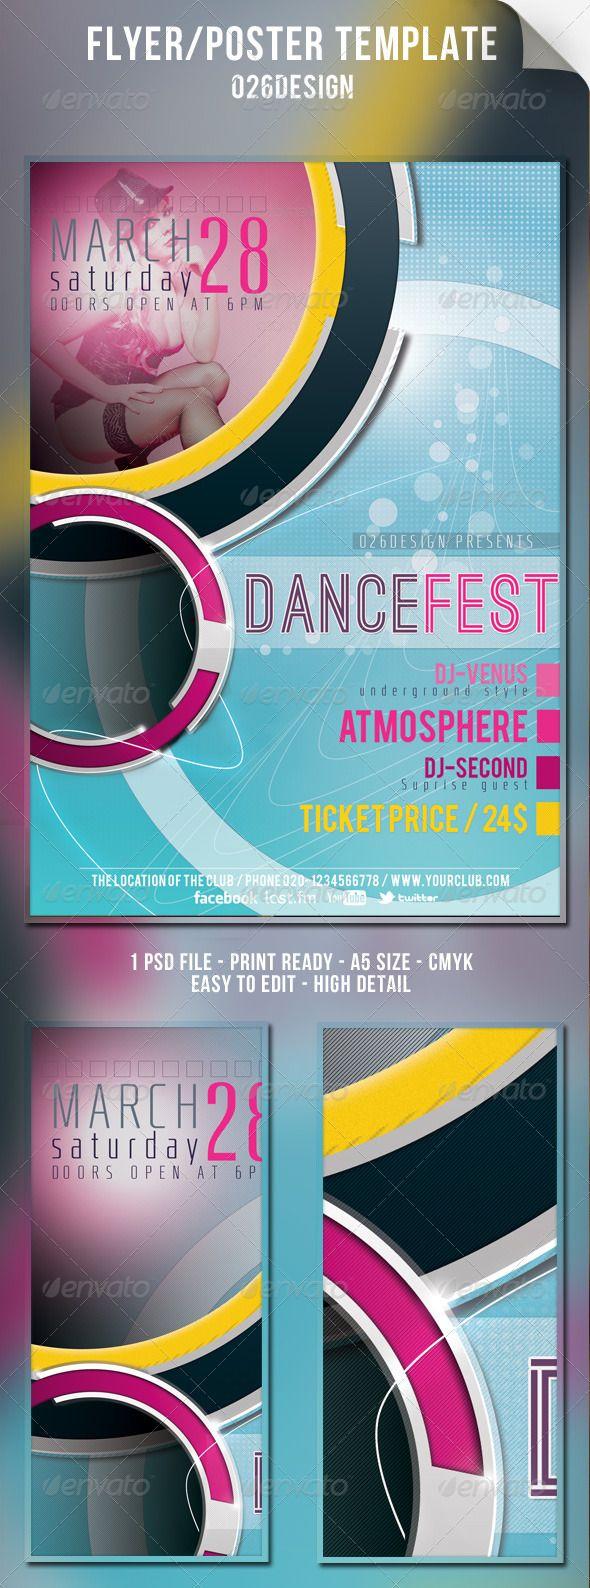 Stunning Dance Party Flyer 590 x 1588 · 155 kB · jpeg